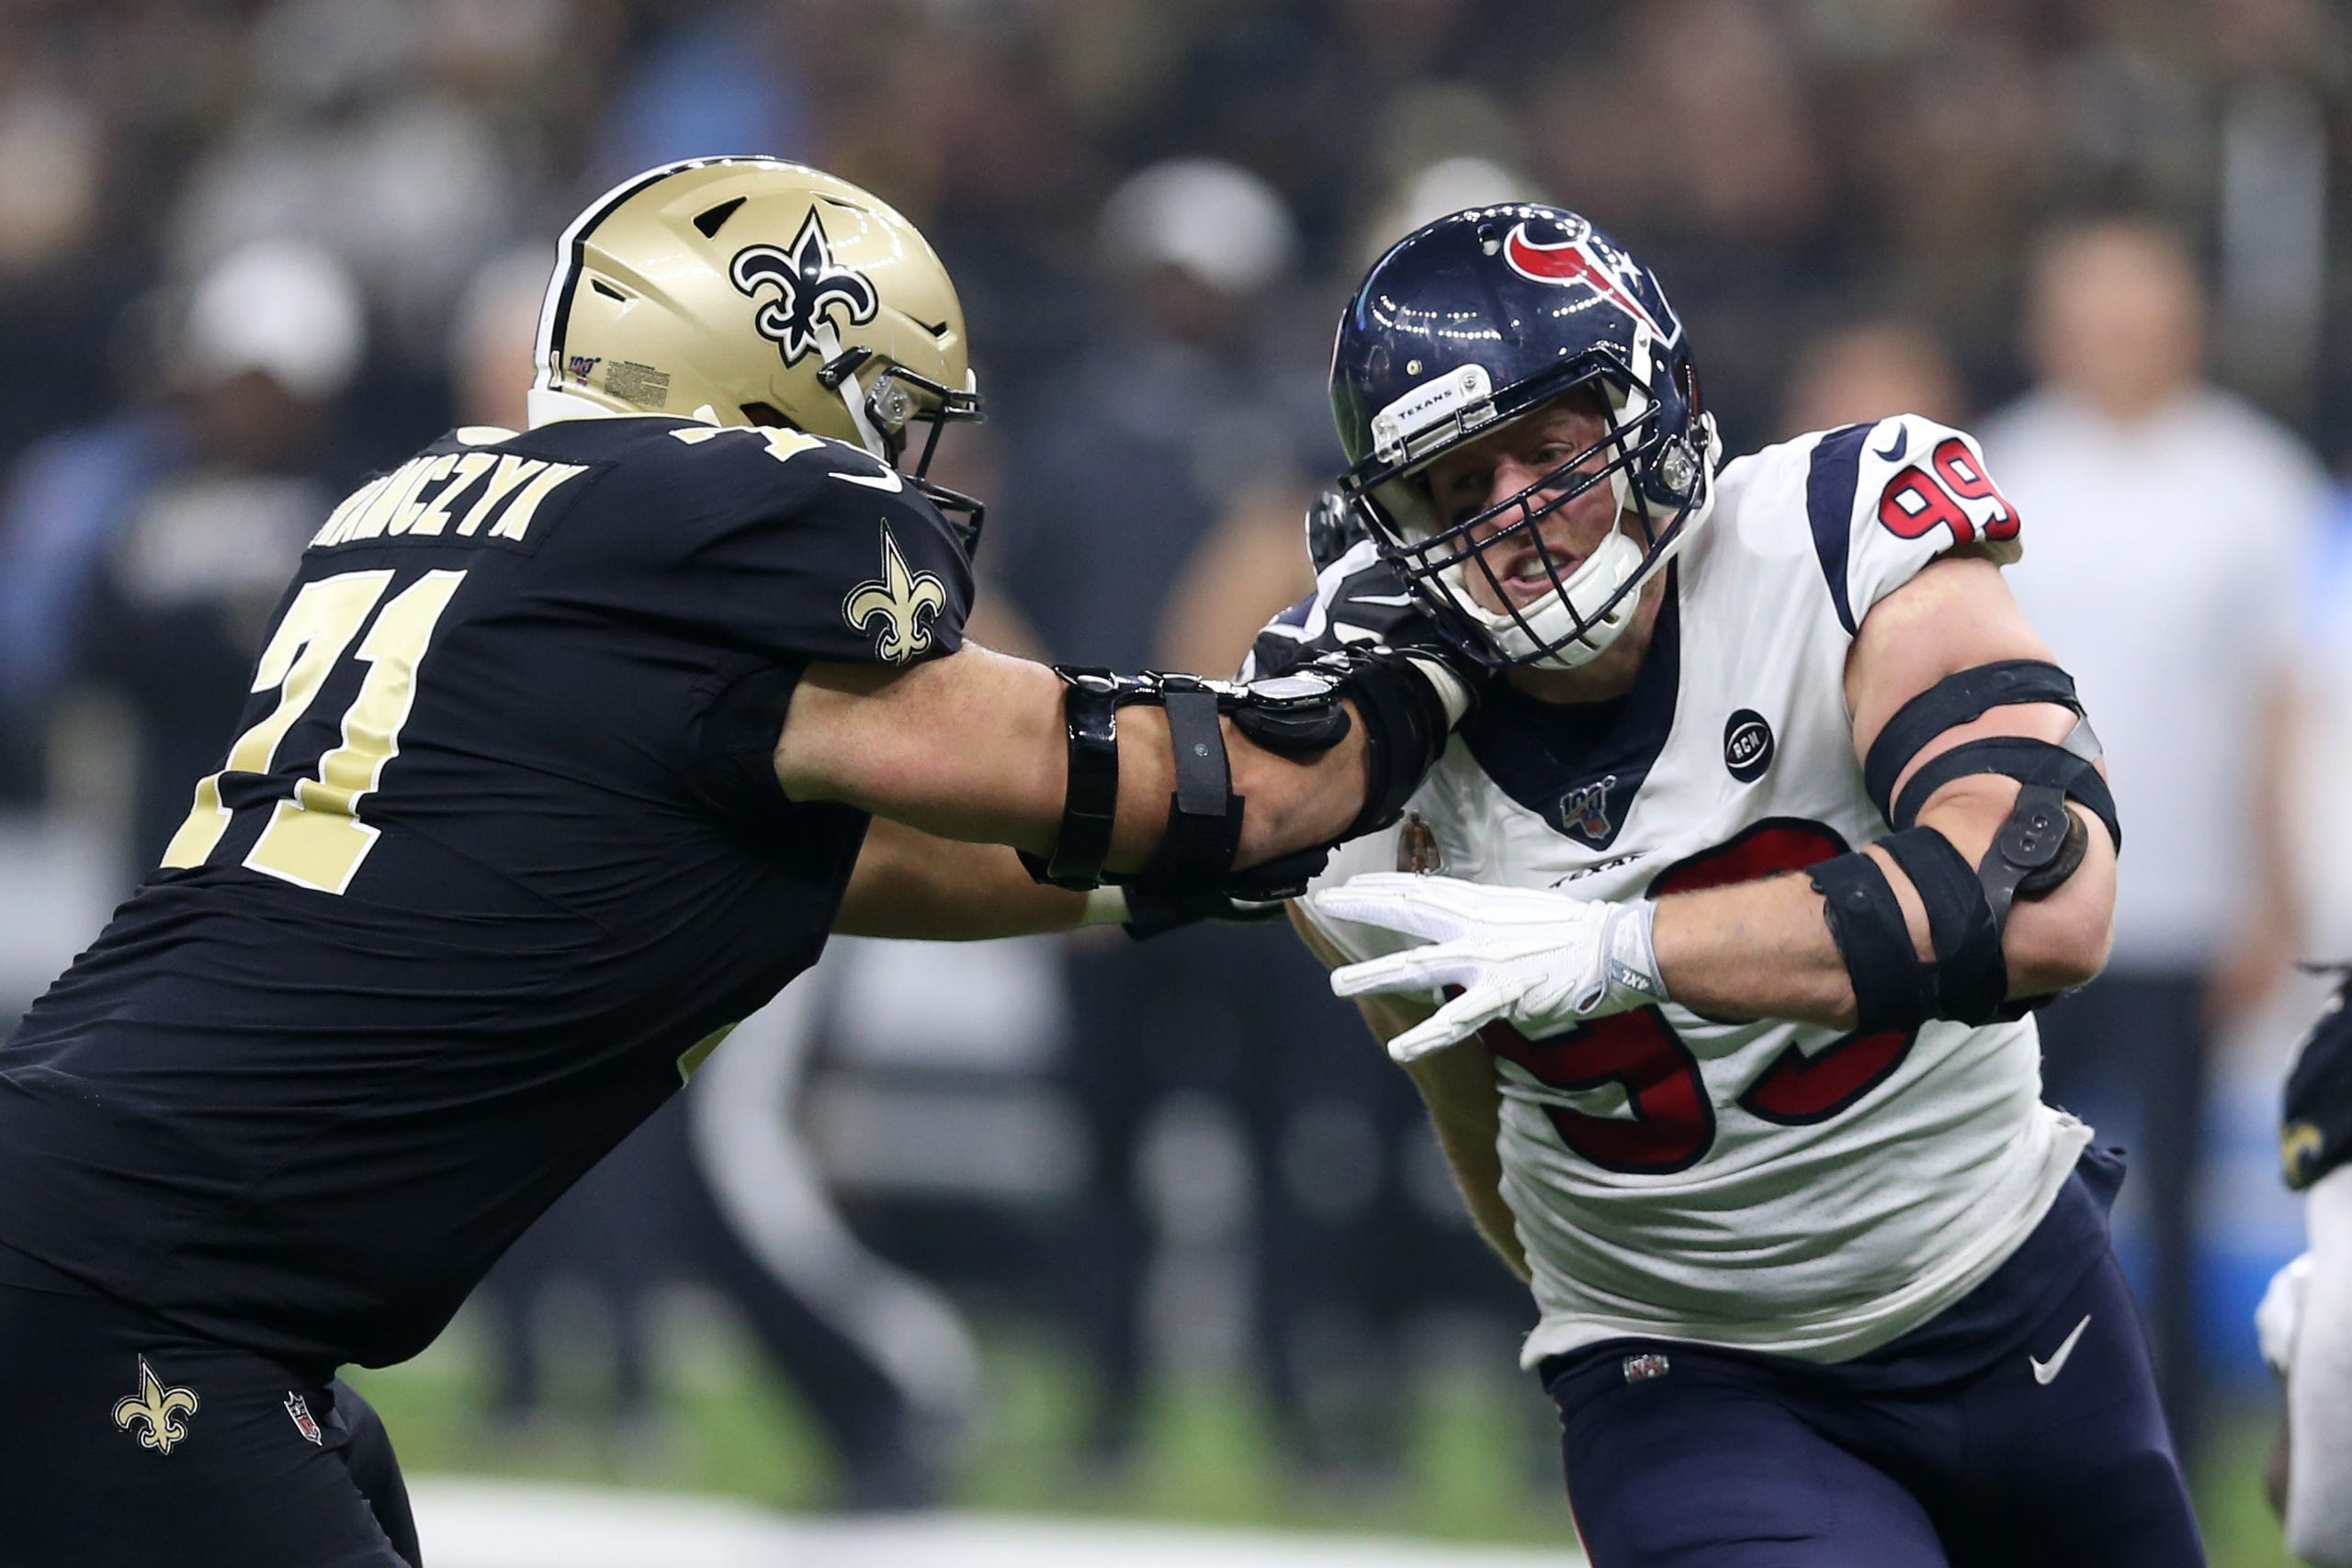 A Look At The Saints Vs Texans First Regular Season Nfl Game